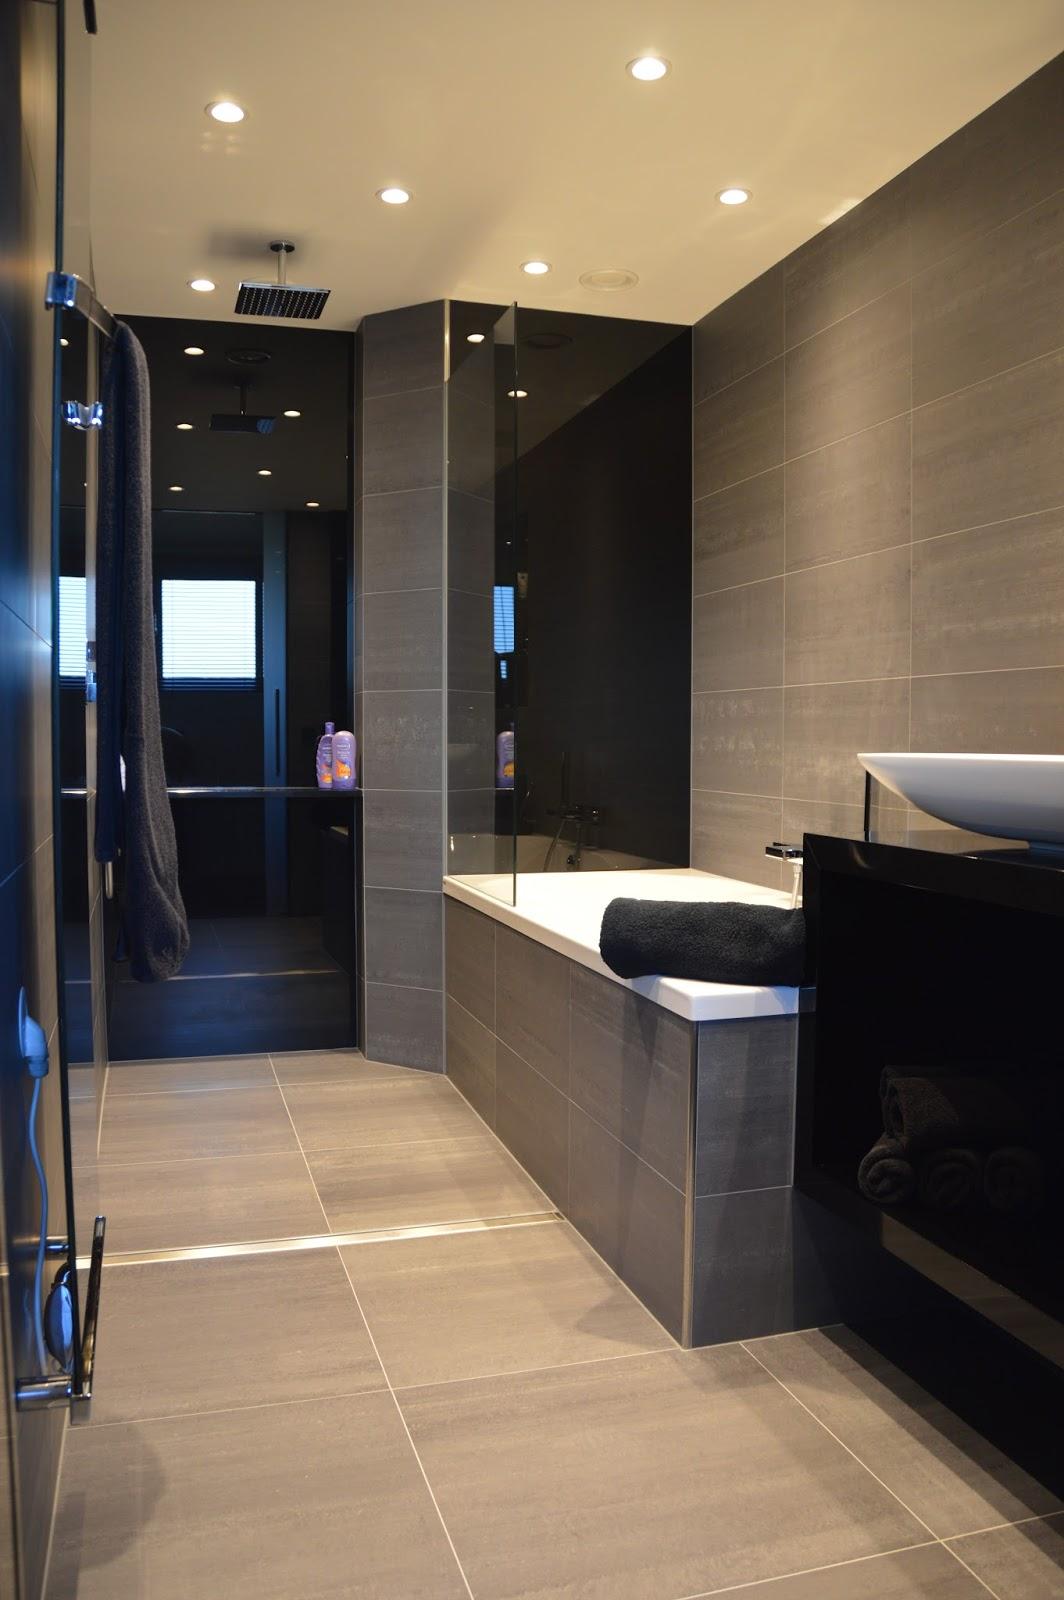 Gp interieur idee blog juni 2015 - Glazen kamer bad ...